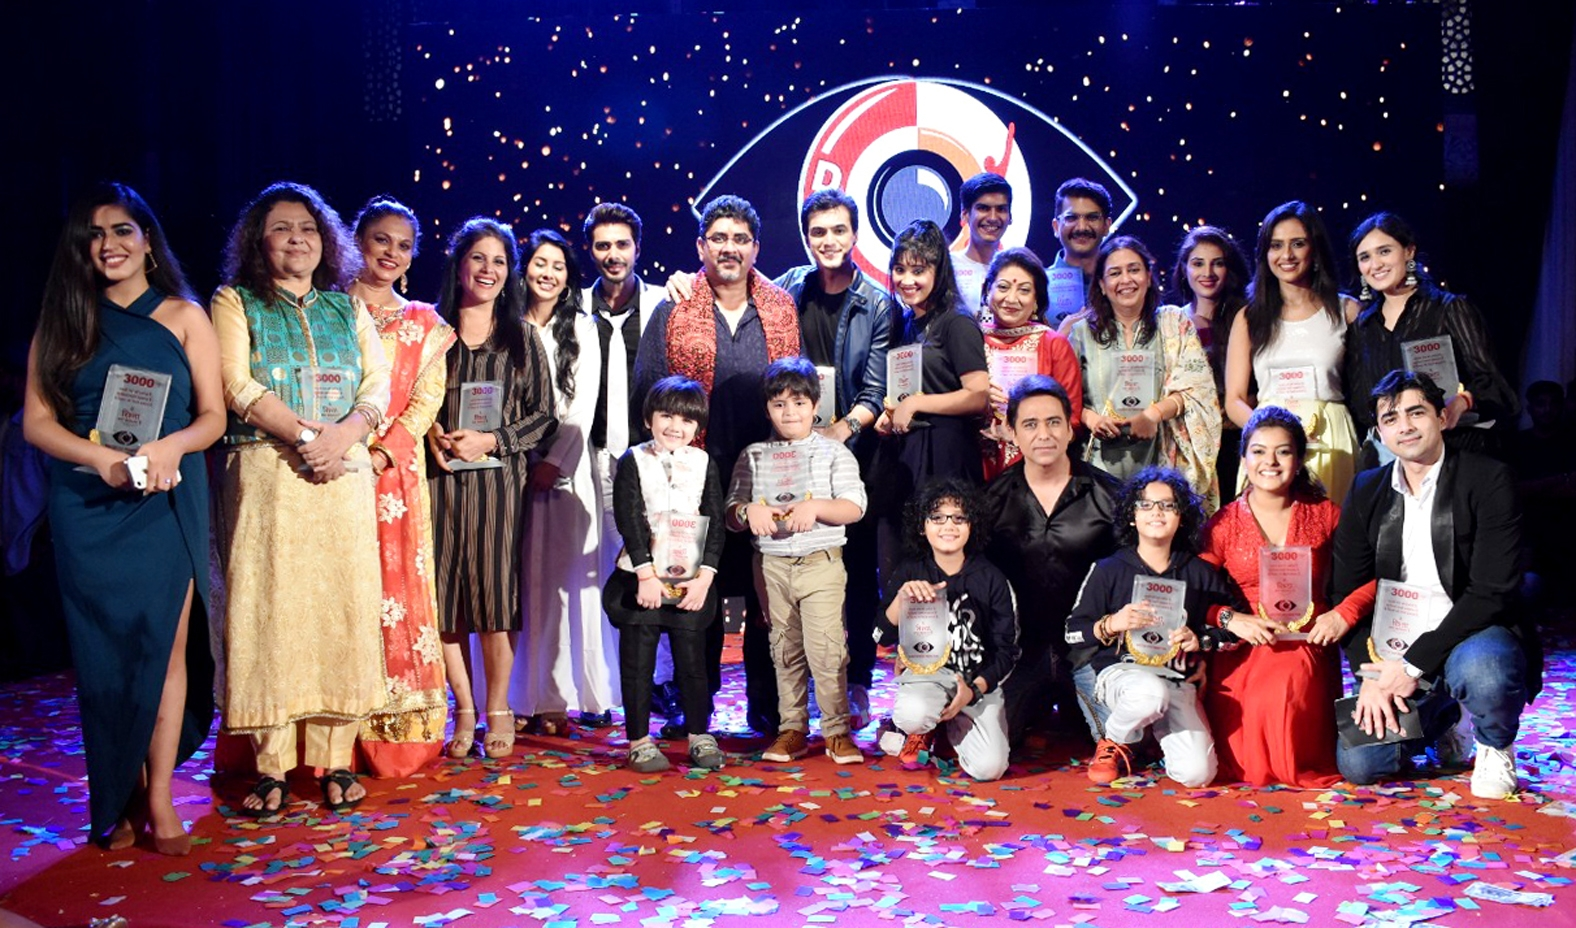 Pics: 'Yeh Rishta Kya Kehlata Hai' Team Celebrates 3000 Episodes